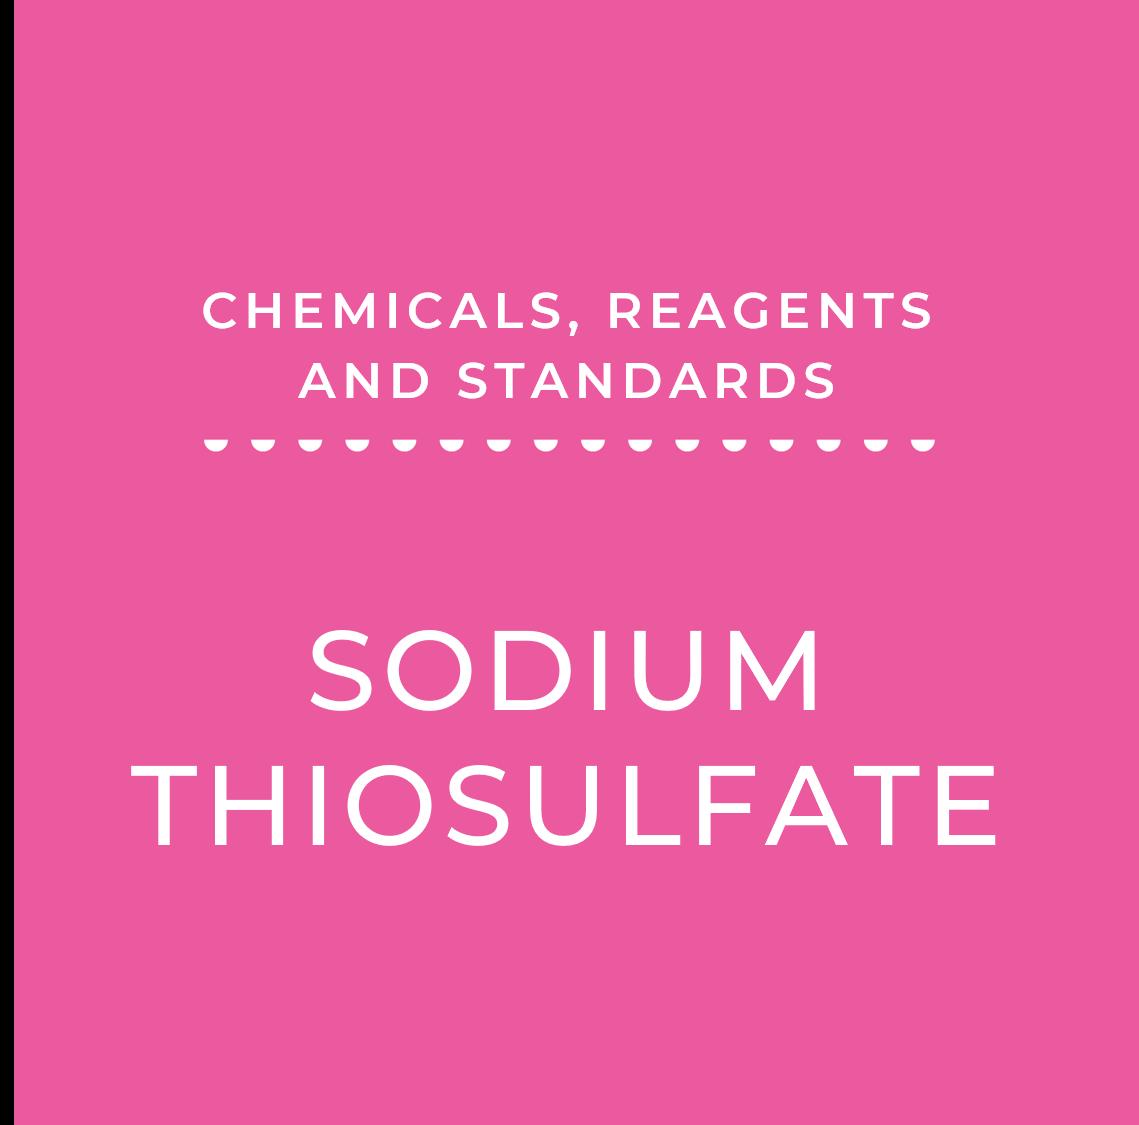 0.1N Sodium Thiosulfate